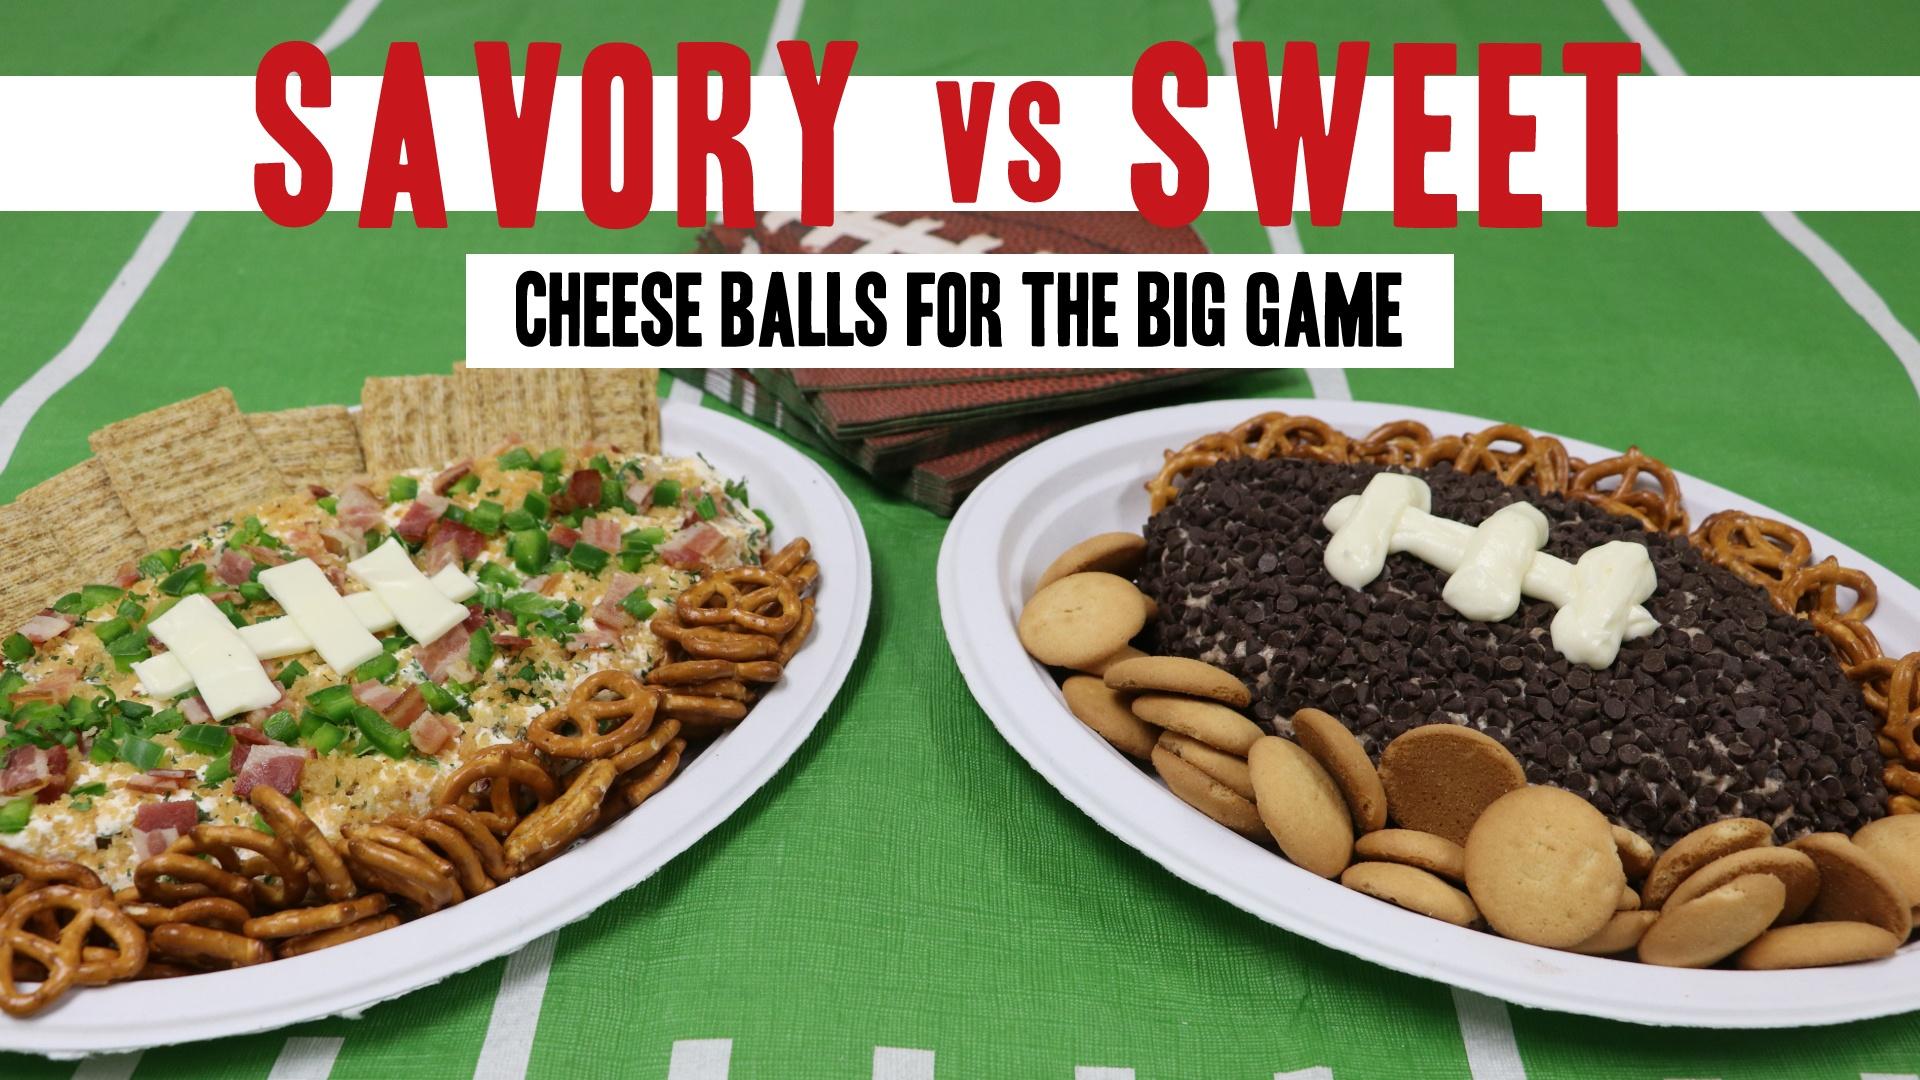 Super Bowl Party Cheese Ball Recipes: Savory vs. Sweet Showdown